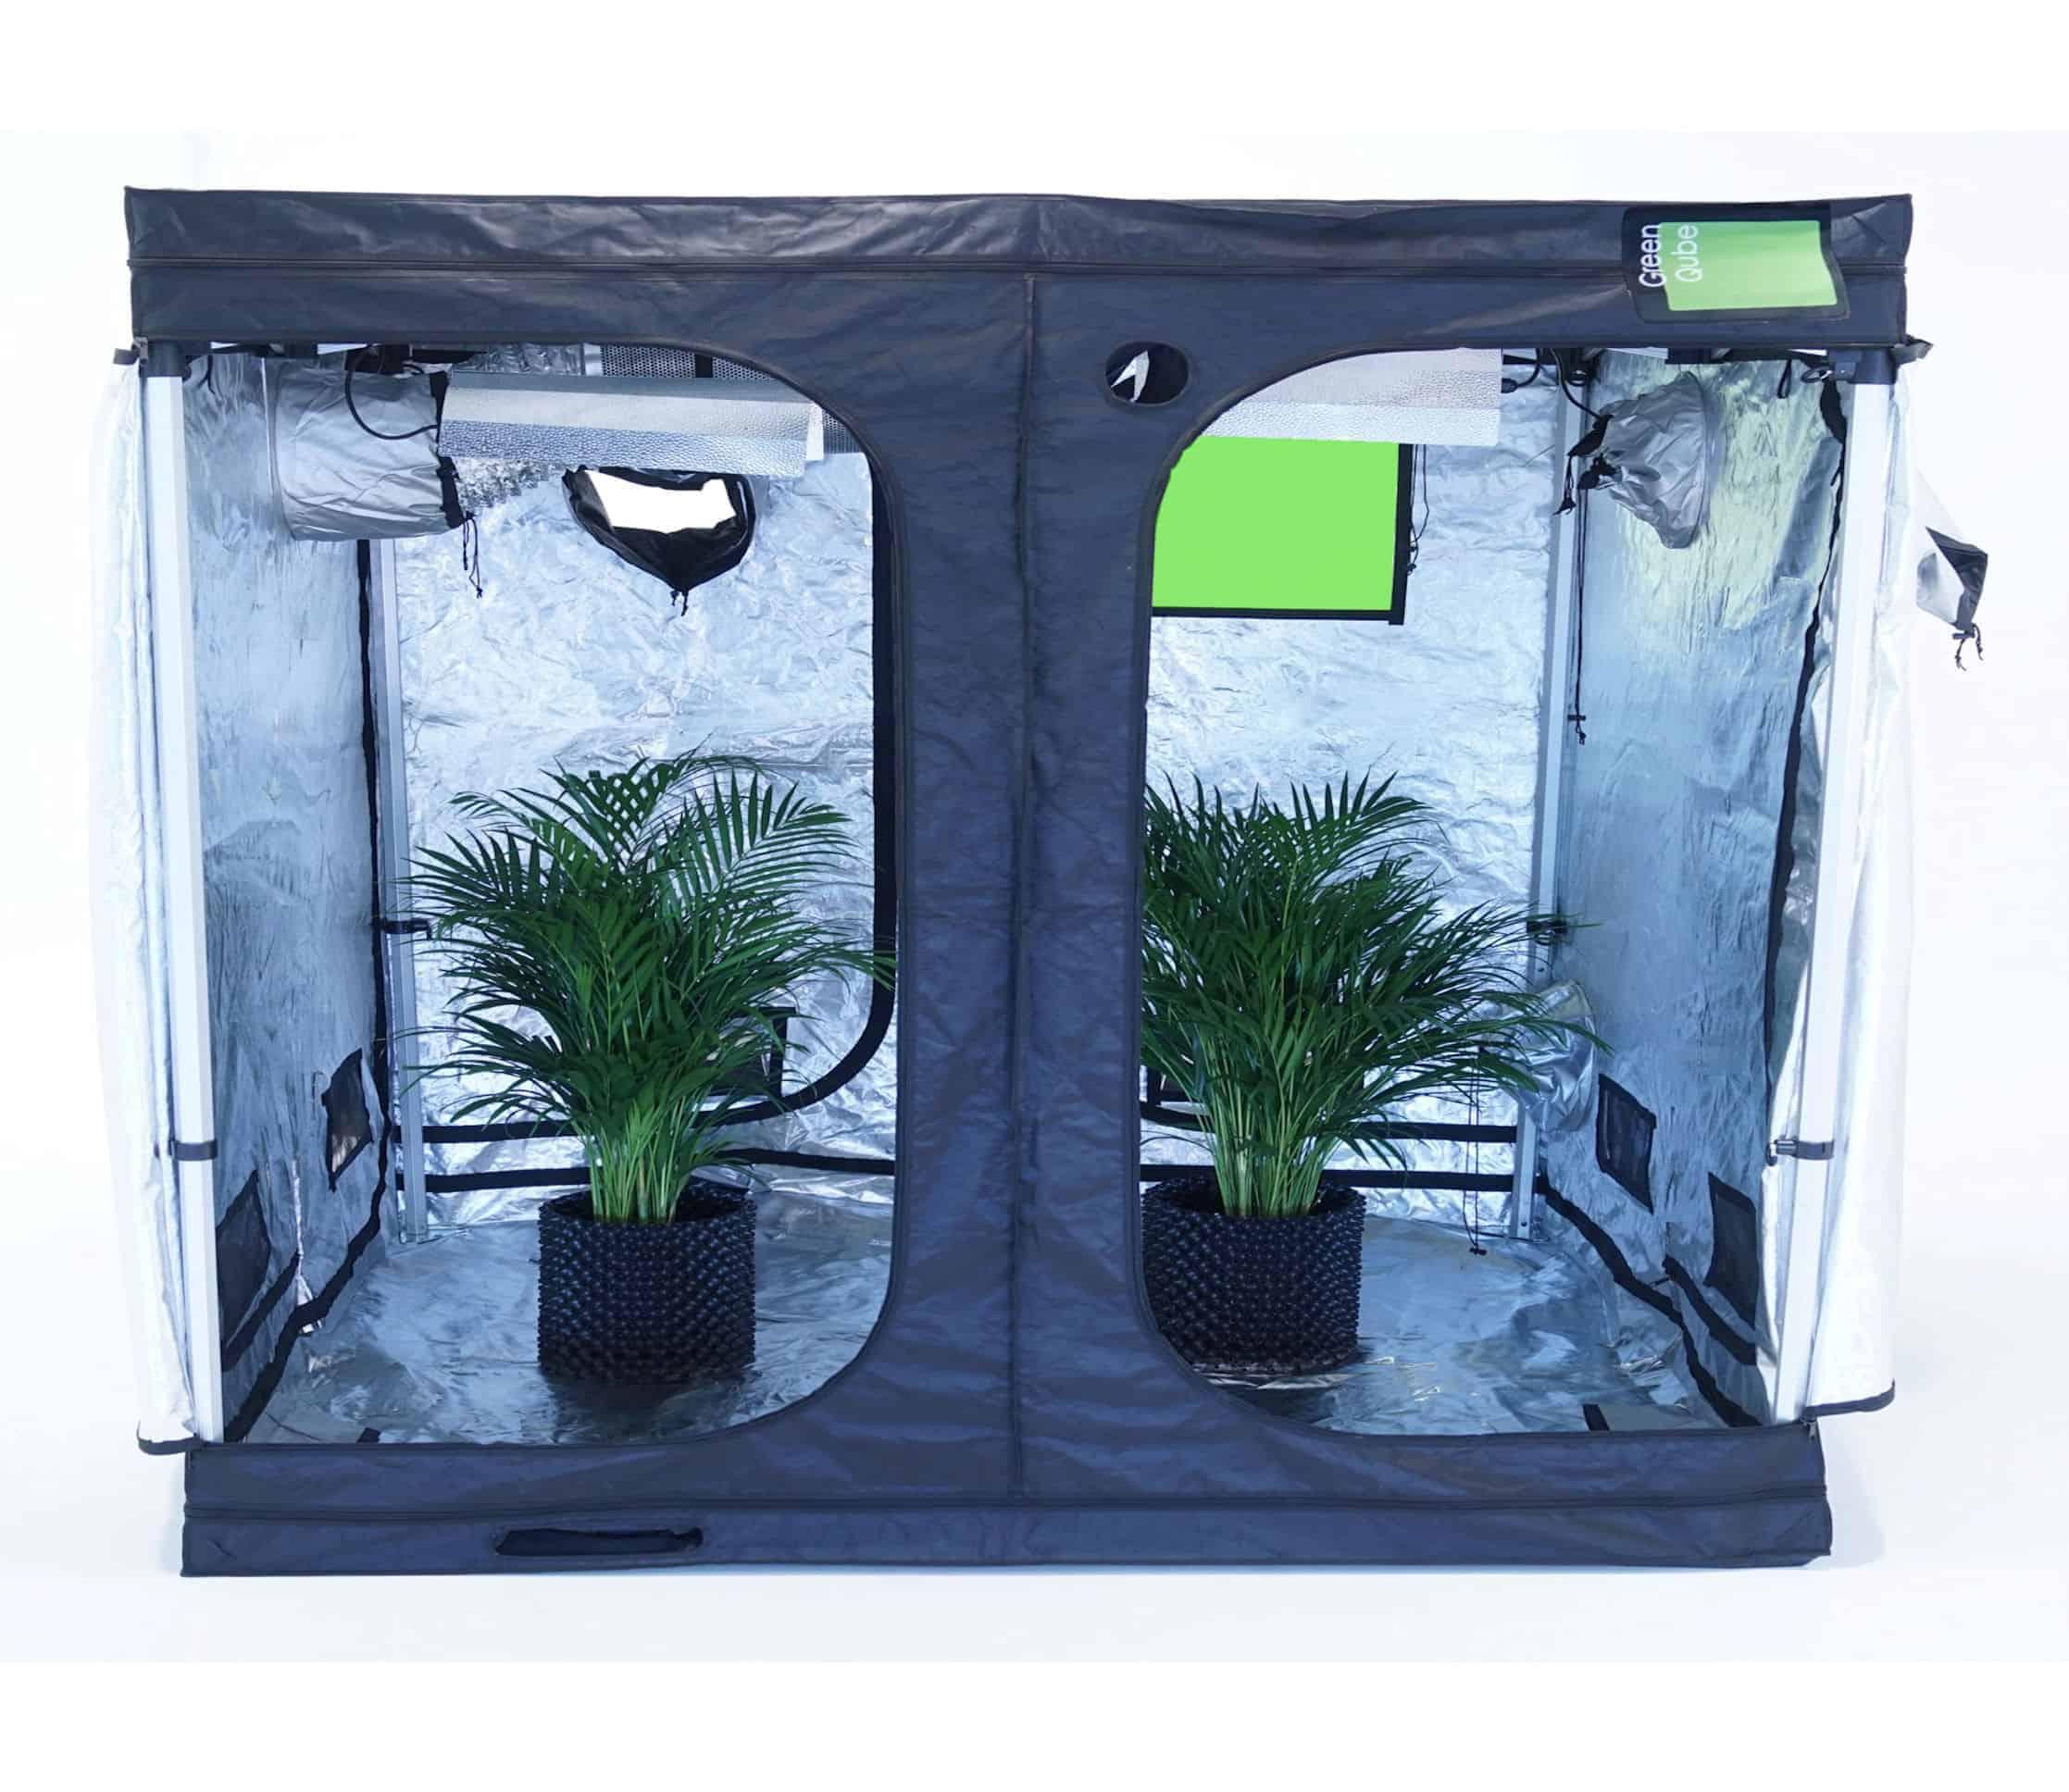 Quick Qube grow tents